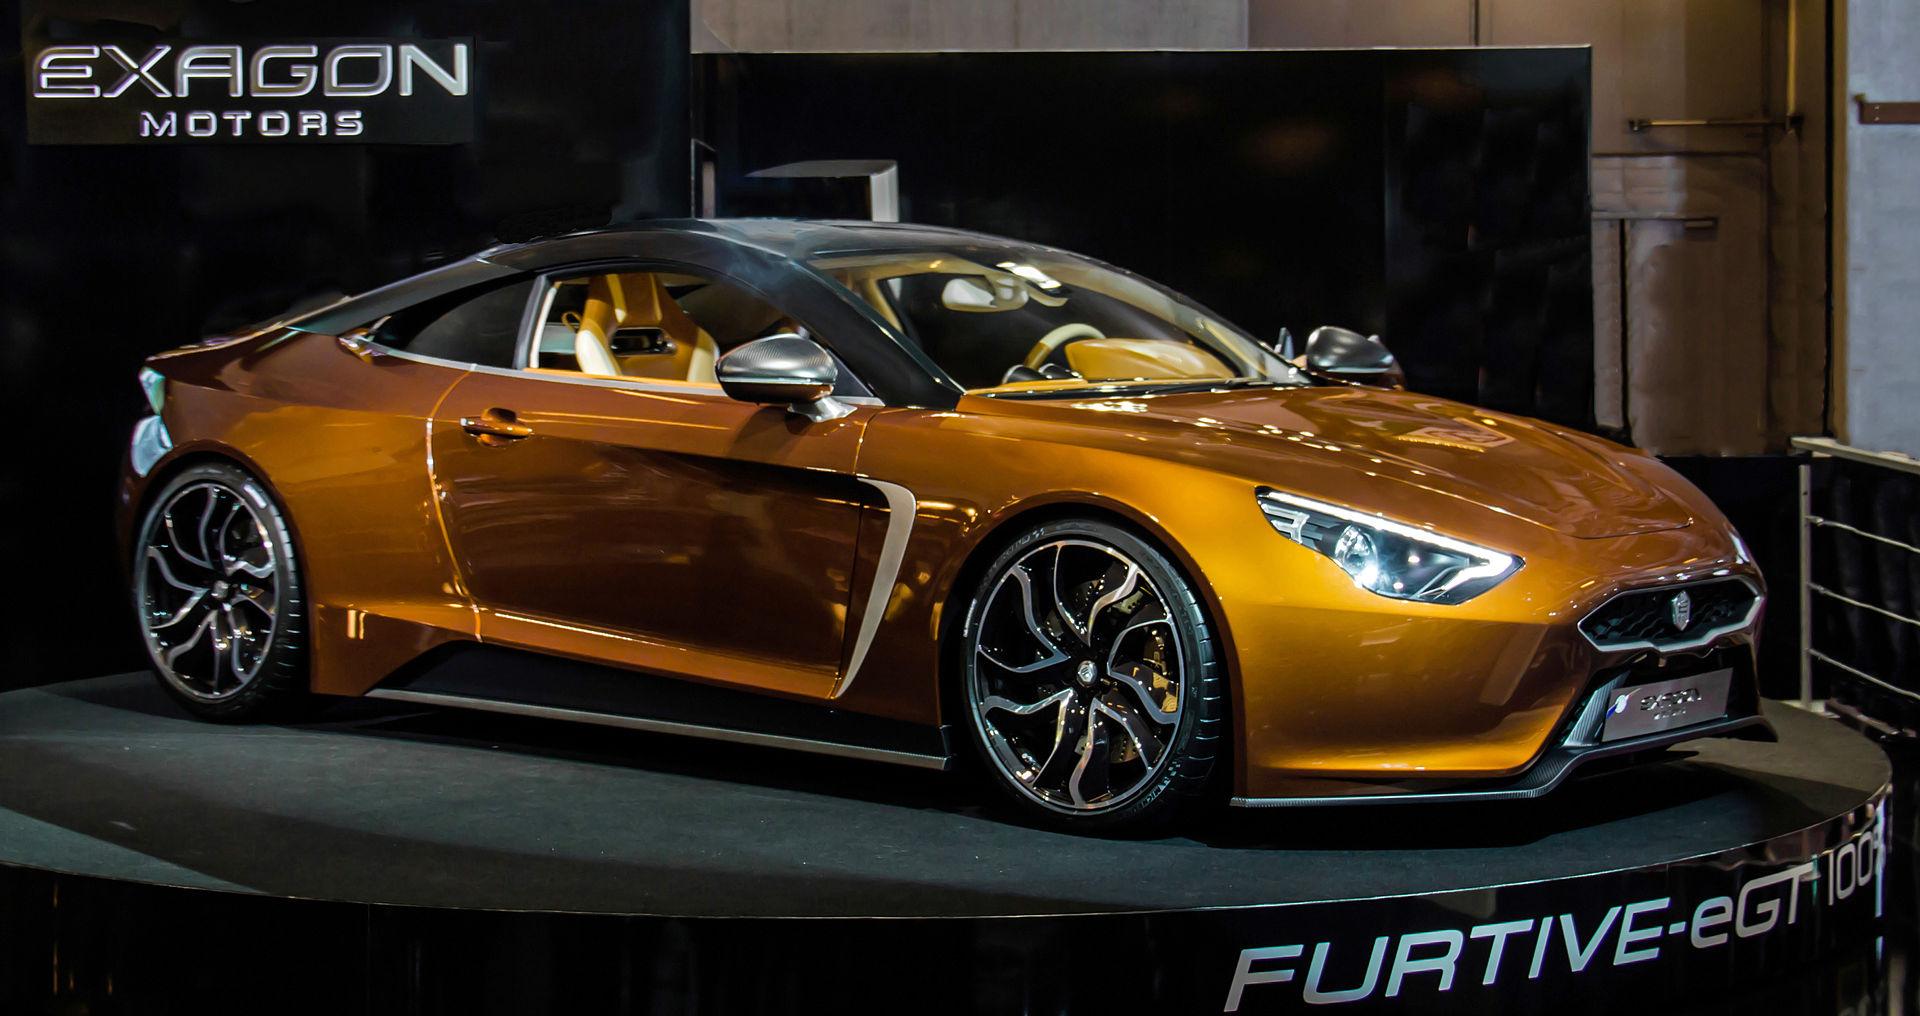 Electric Car Battery >> Exagon Furtive-eGT - Wikipedia